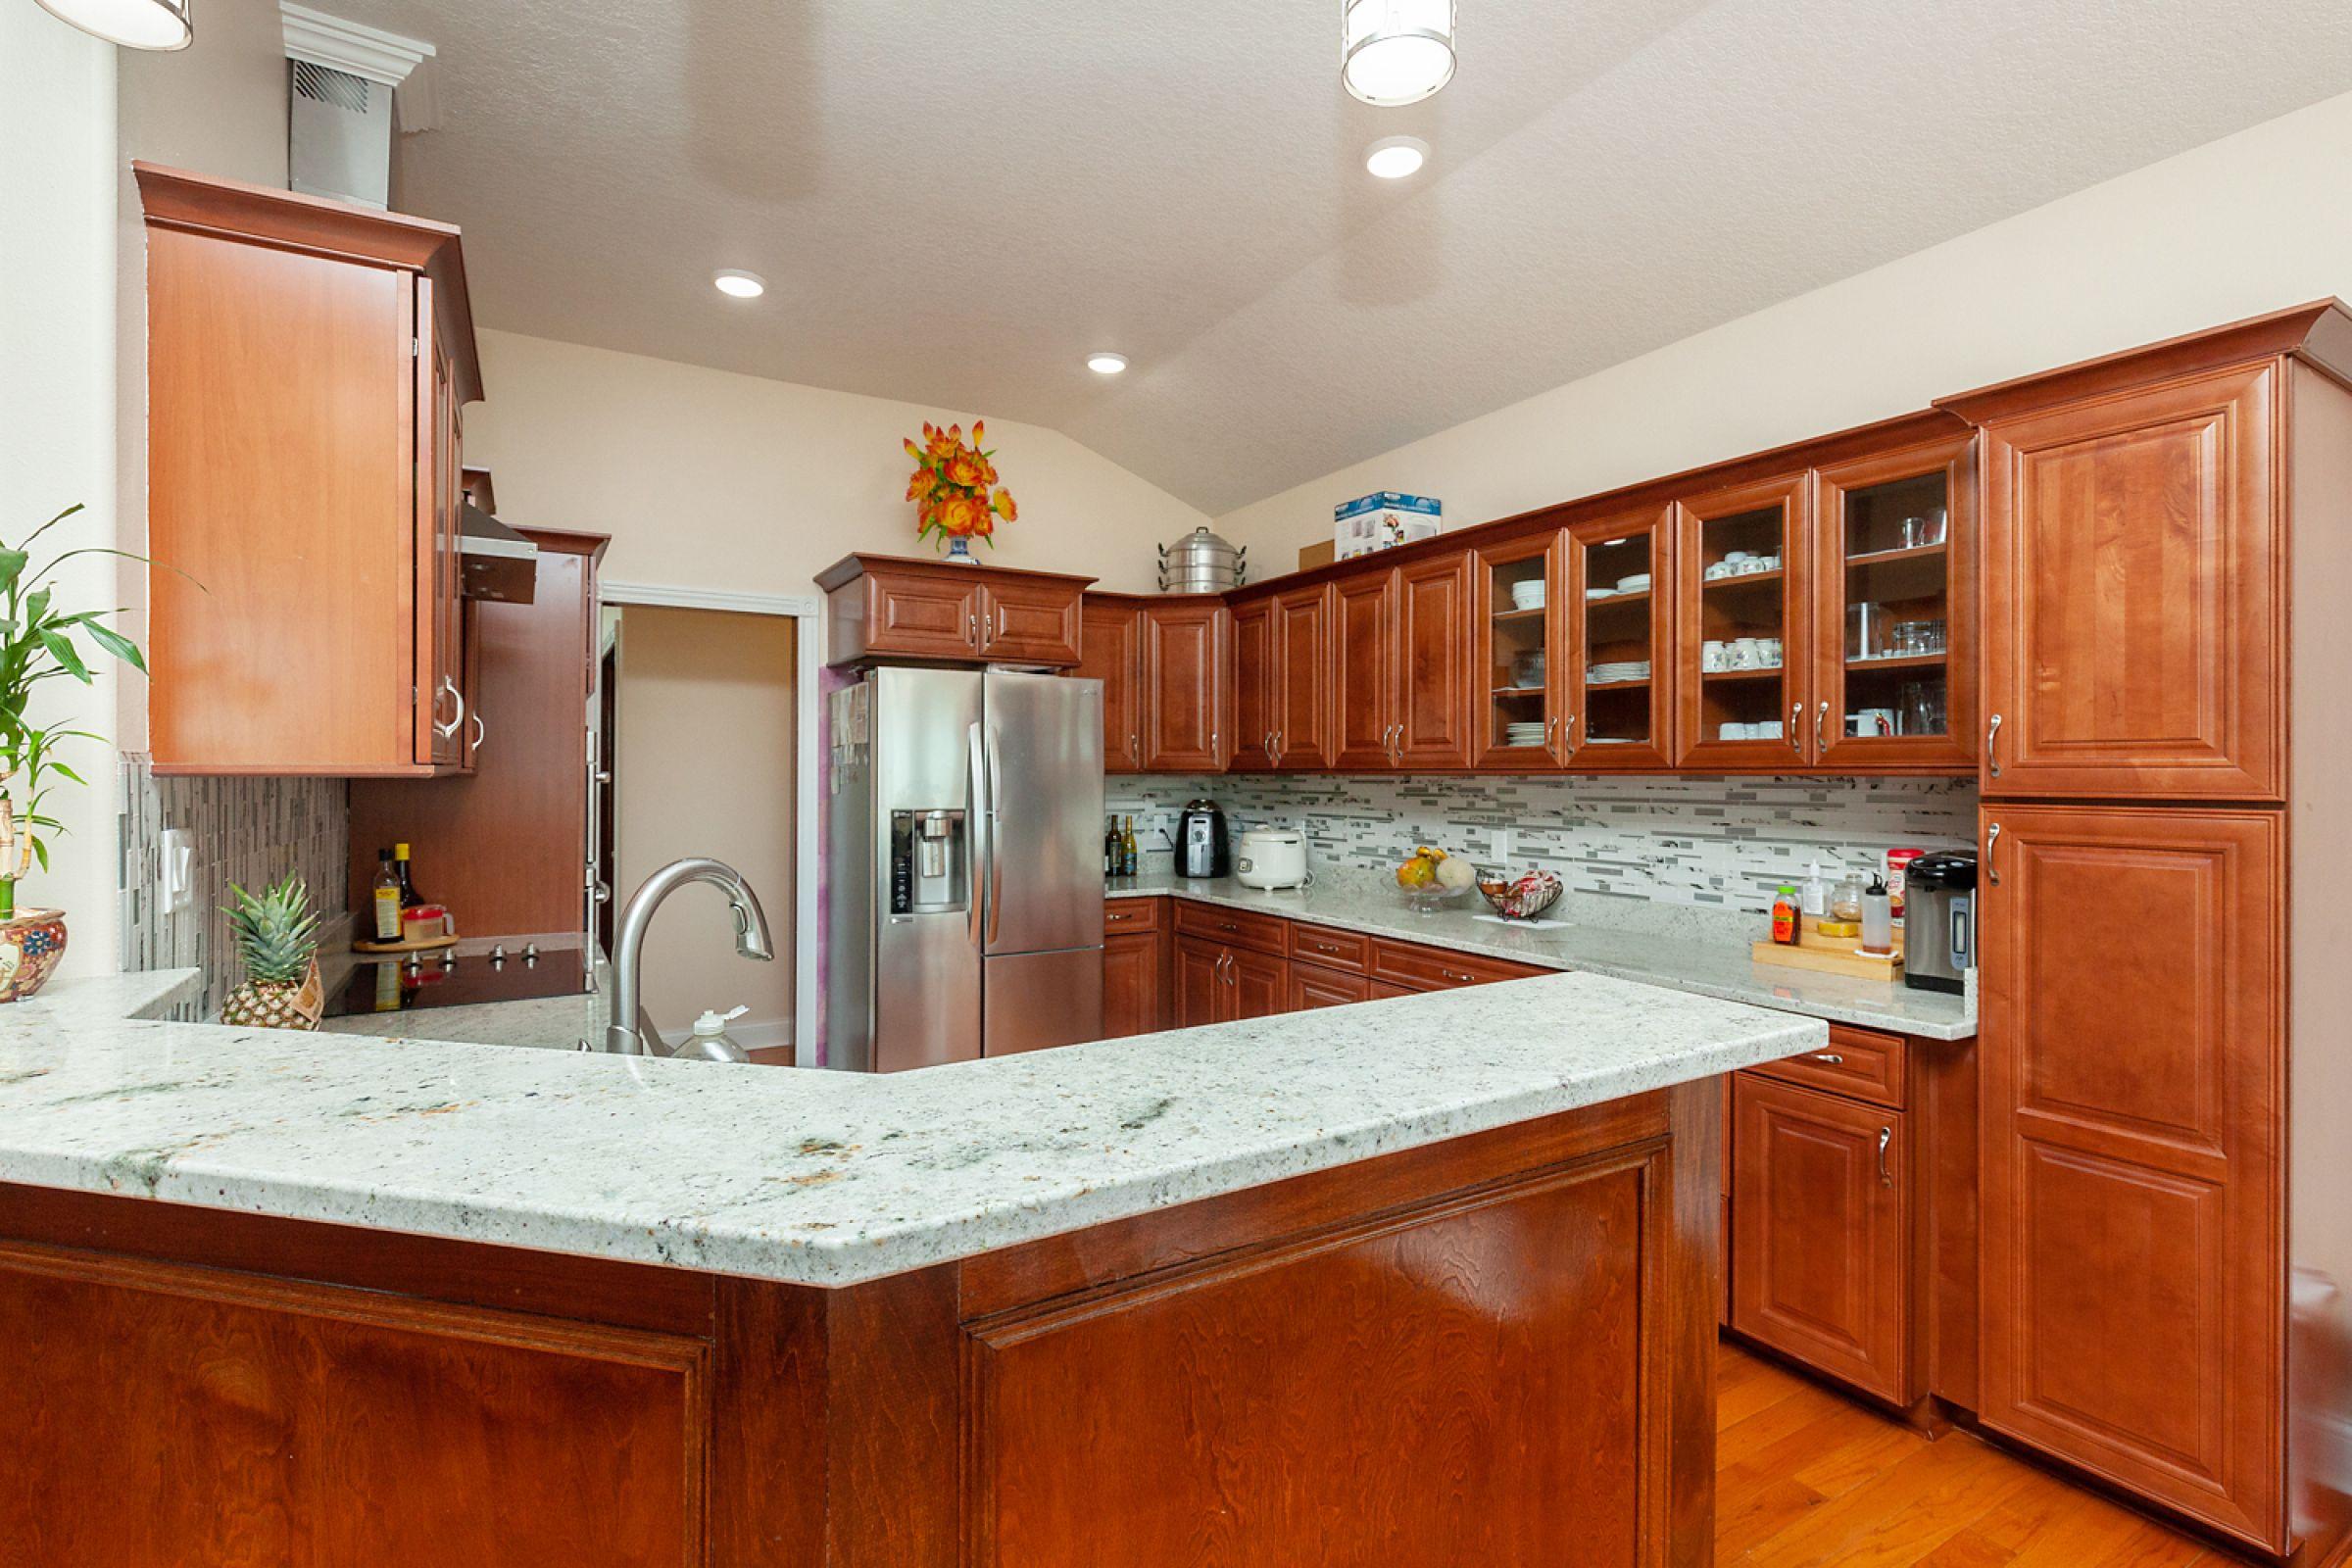 residential-polk-county-iowa-0-acres-listing-number-15403-3-2021-03-12-053307.jpg